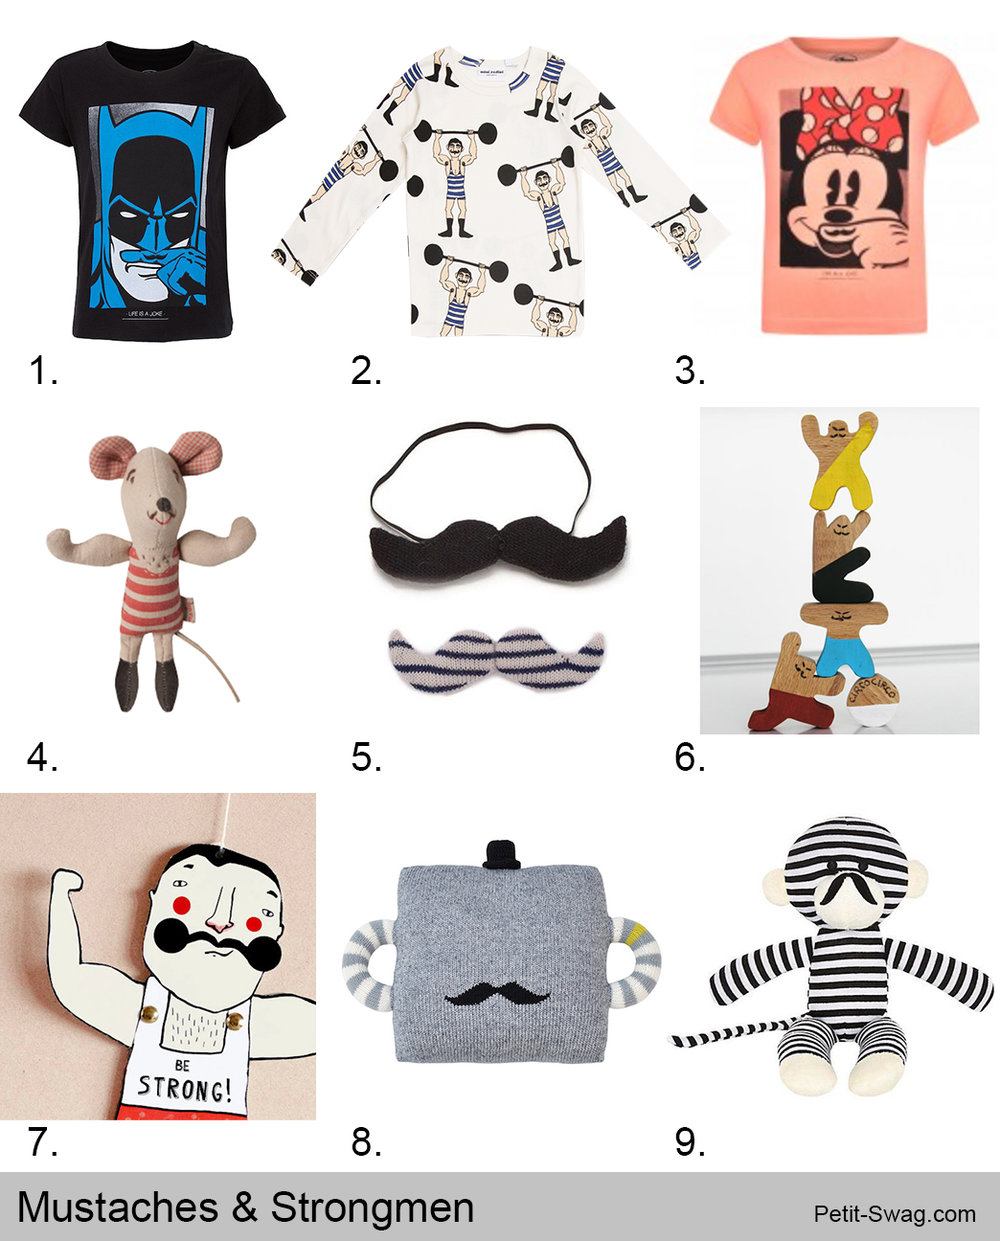 Mustaches & Strong Men   Petit-Swag.com